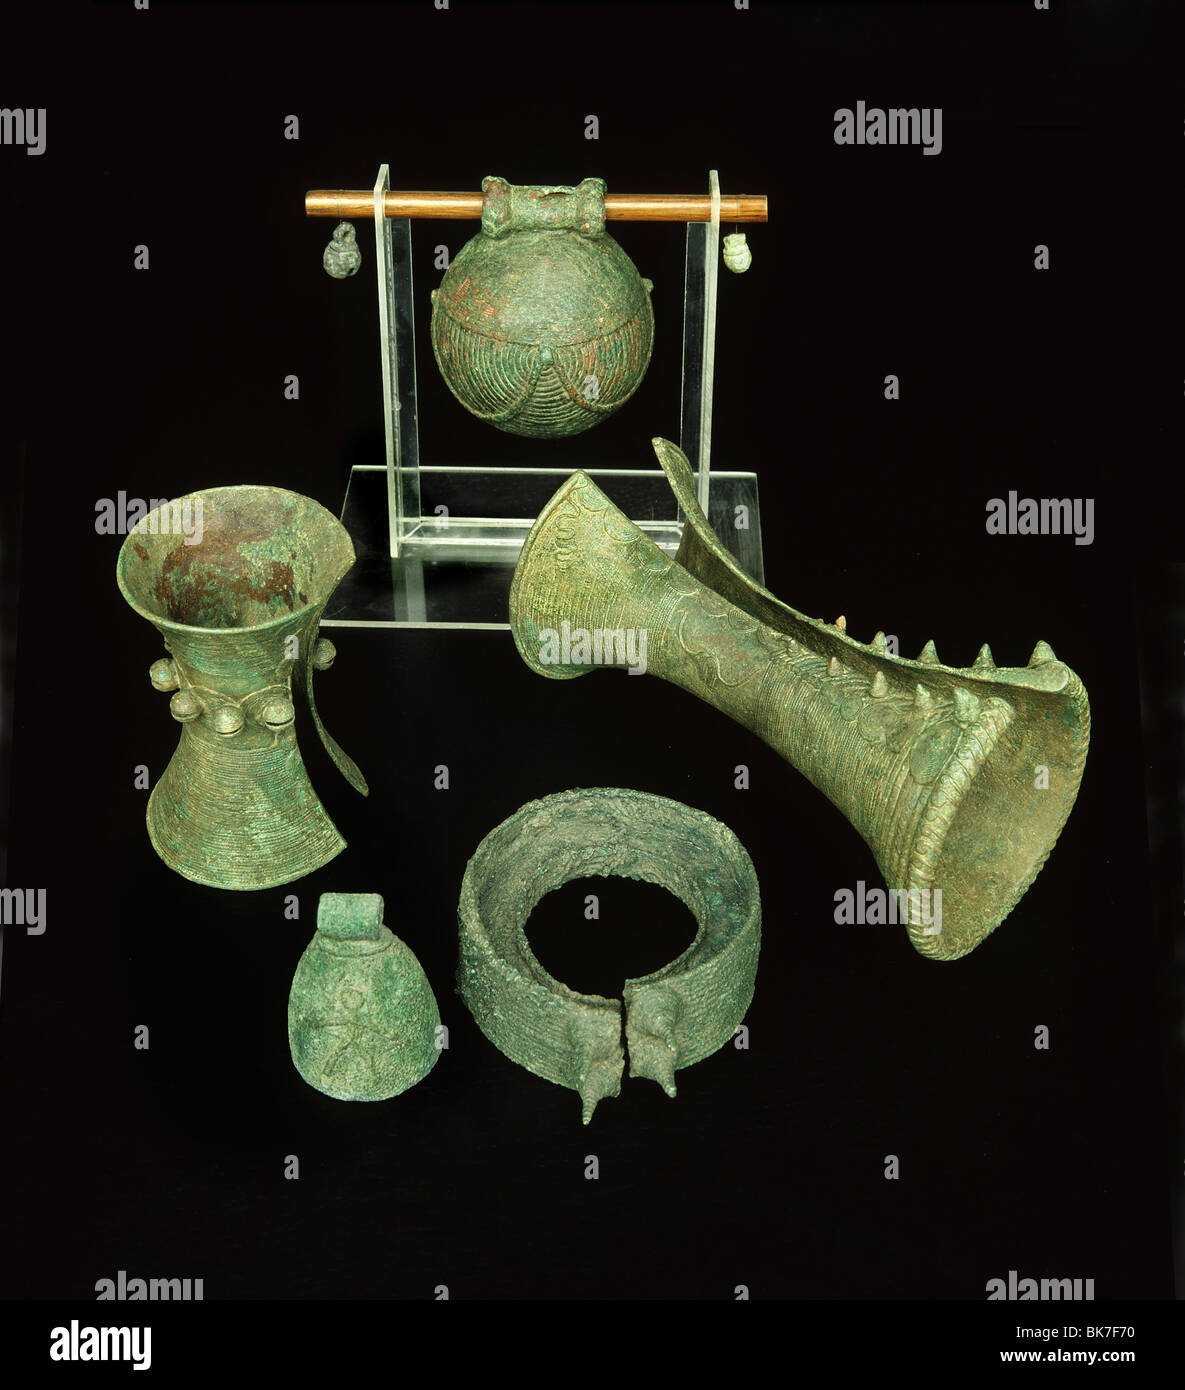 Ban Chiang bronzes, Suan Pakaad Museum, Bangkok, Thailand, Southeast Asia, Asia&#10, - Stock Image